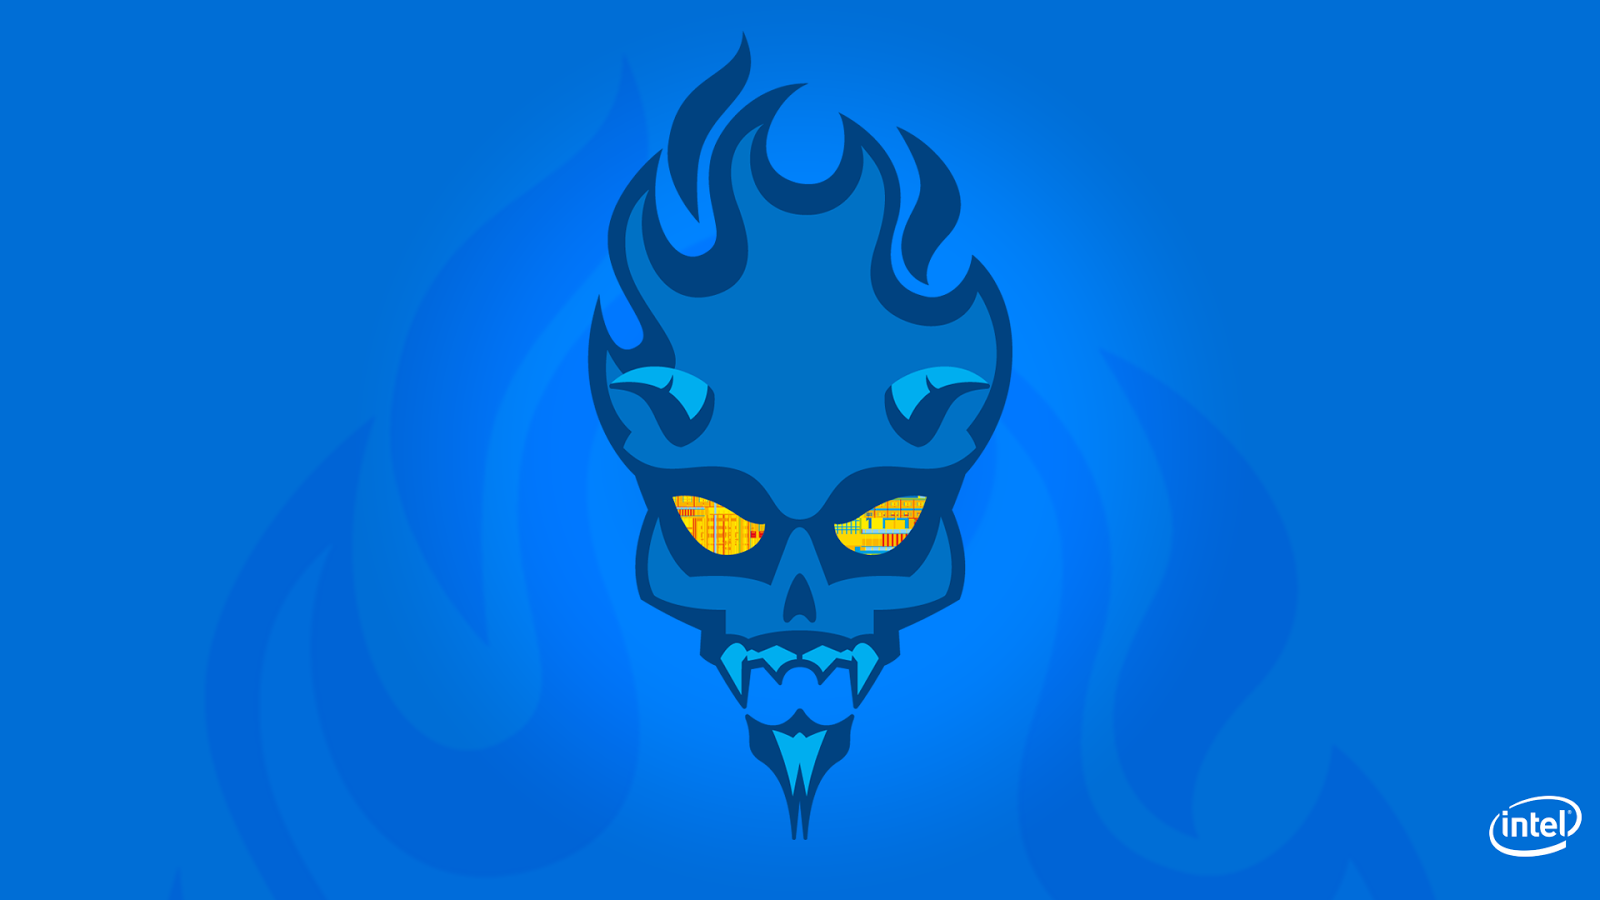 intel-devils-canyon-skull-blue-cpu-k-full-HD-wallpaper-www.epichdwallpapers.com